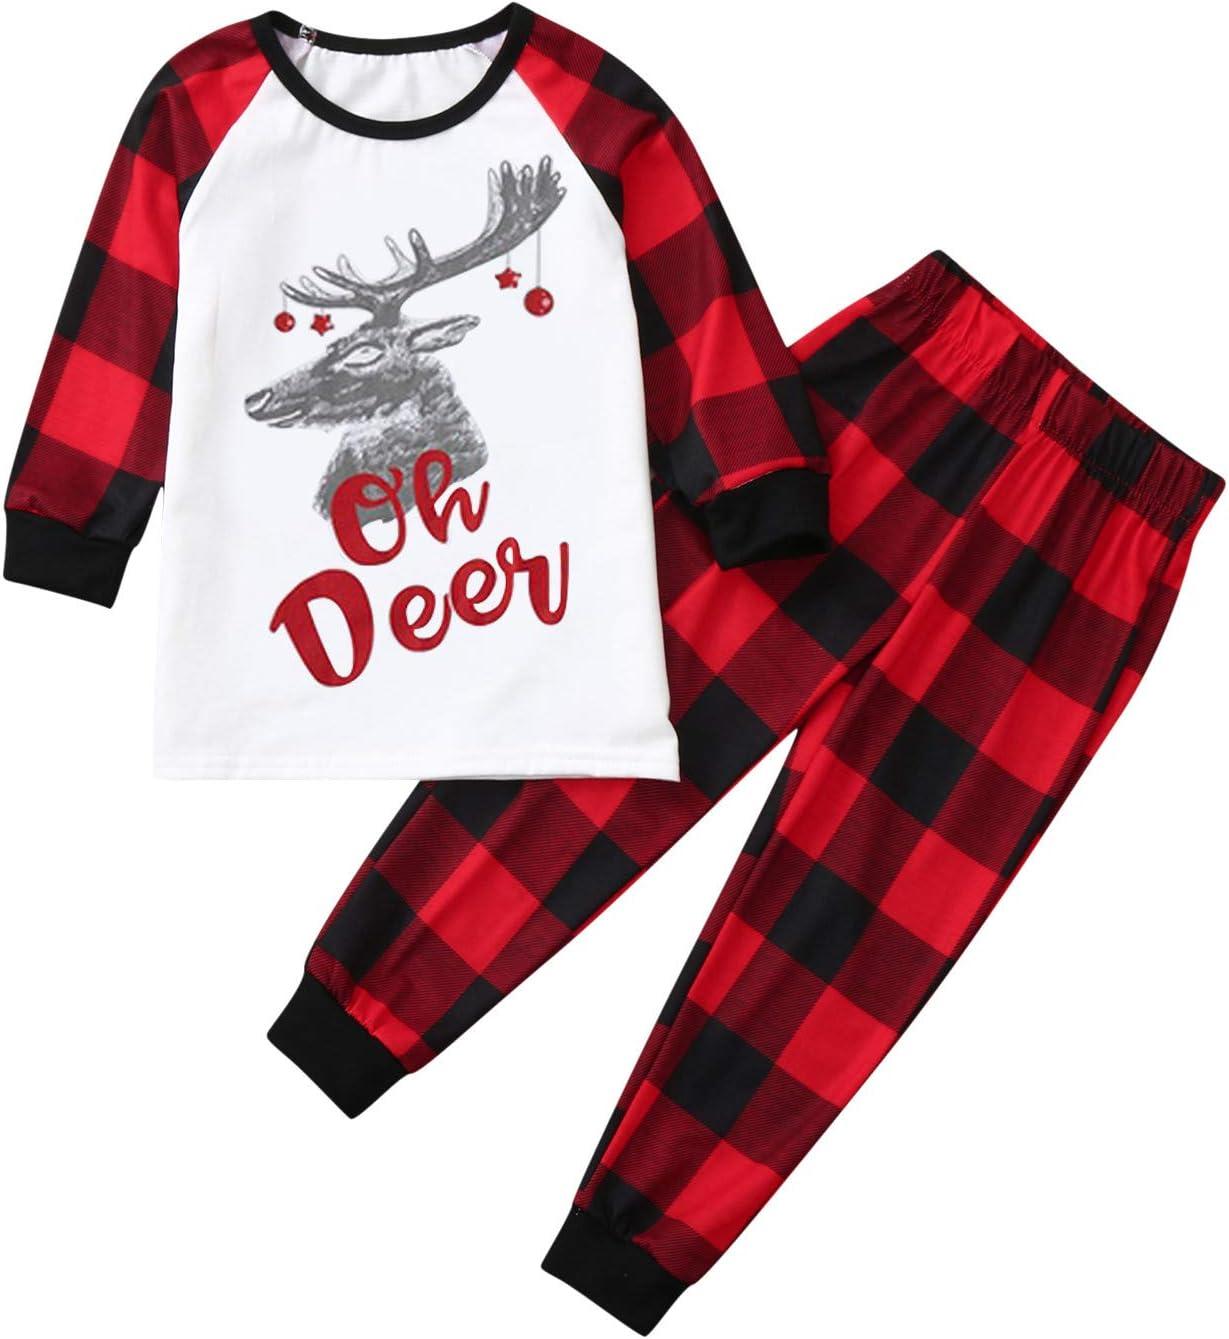 HEWUQI Oh Deer Matching Family Christmas Pajamas Sets for Women Men Boys Girls Plaid Parent-Child Sleepwear for Kids /& Adult